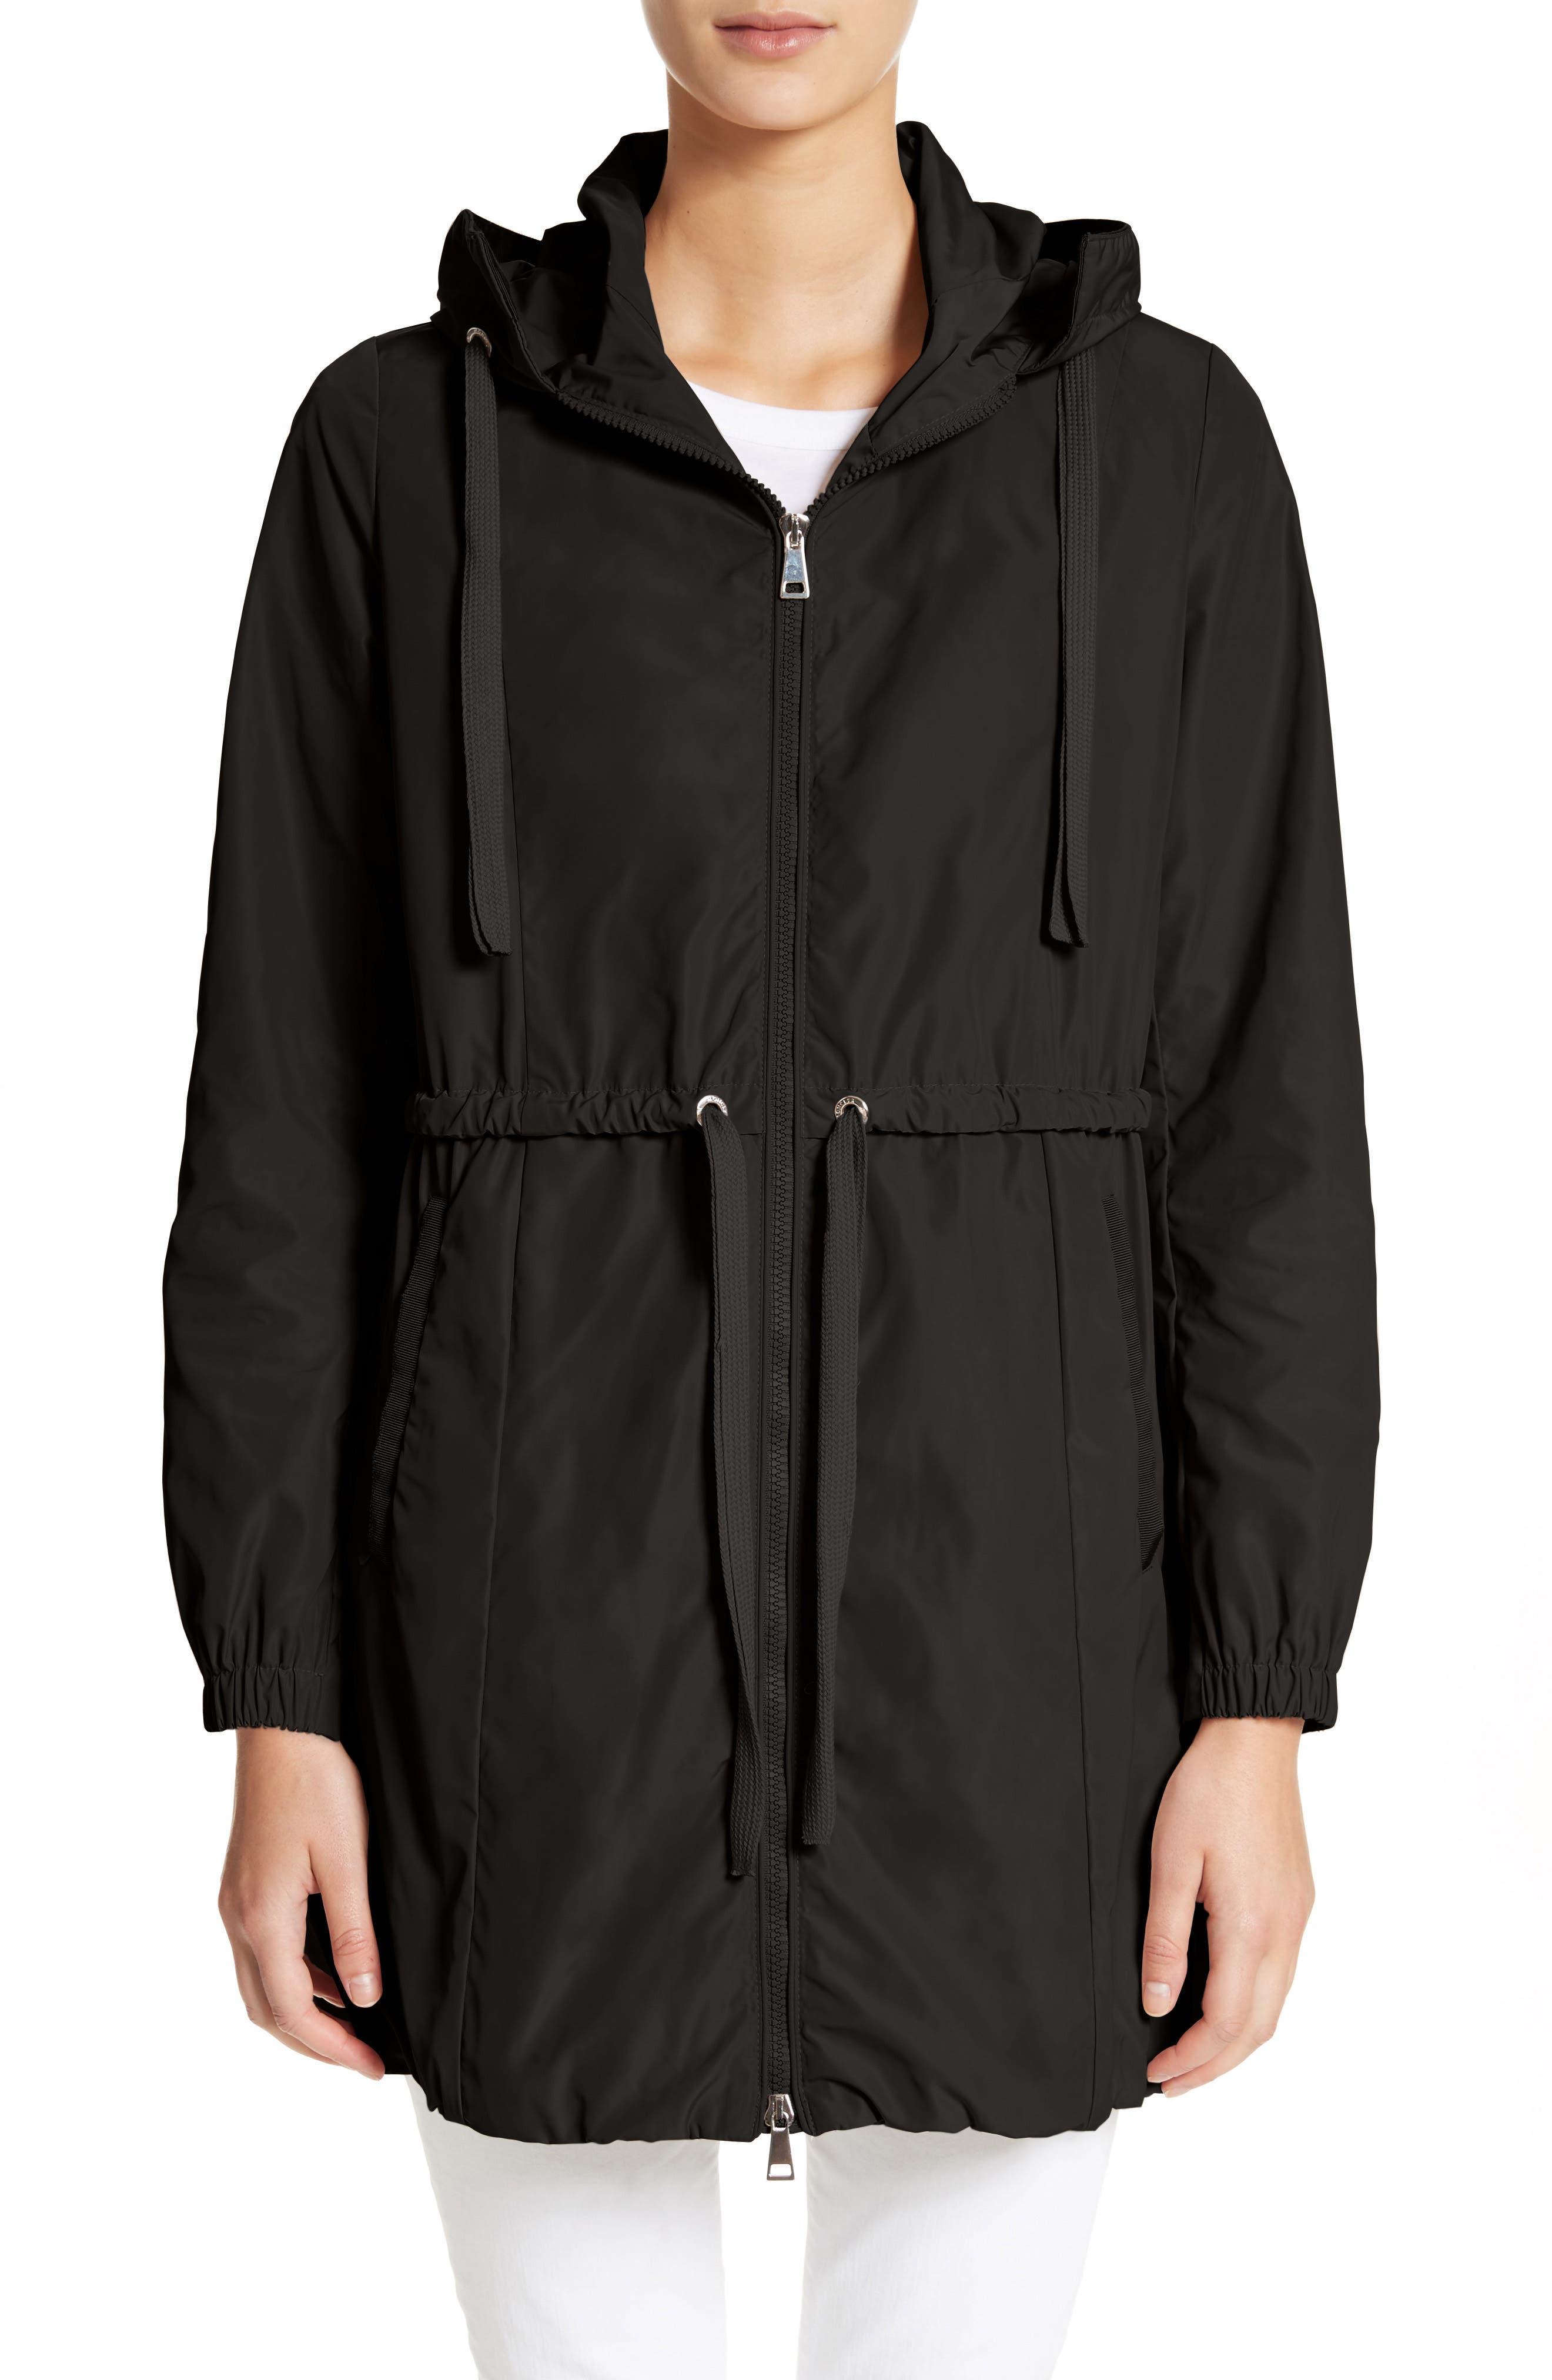 Topaze Water Resistant Hooded Jacket,                         Main,                         color, BLACK